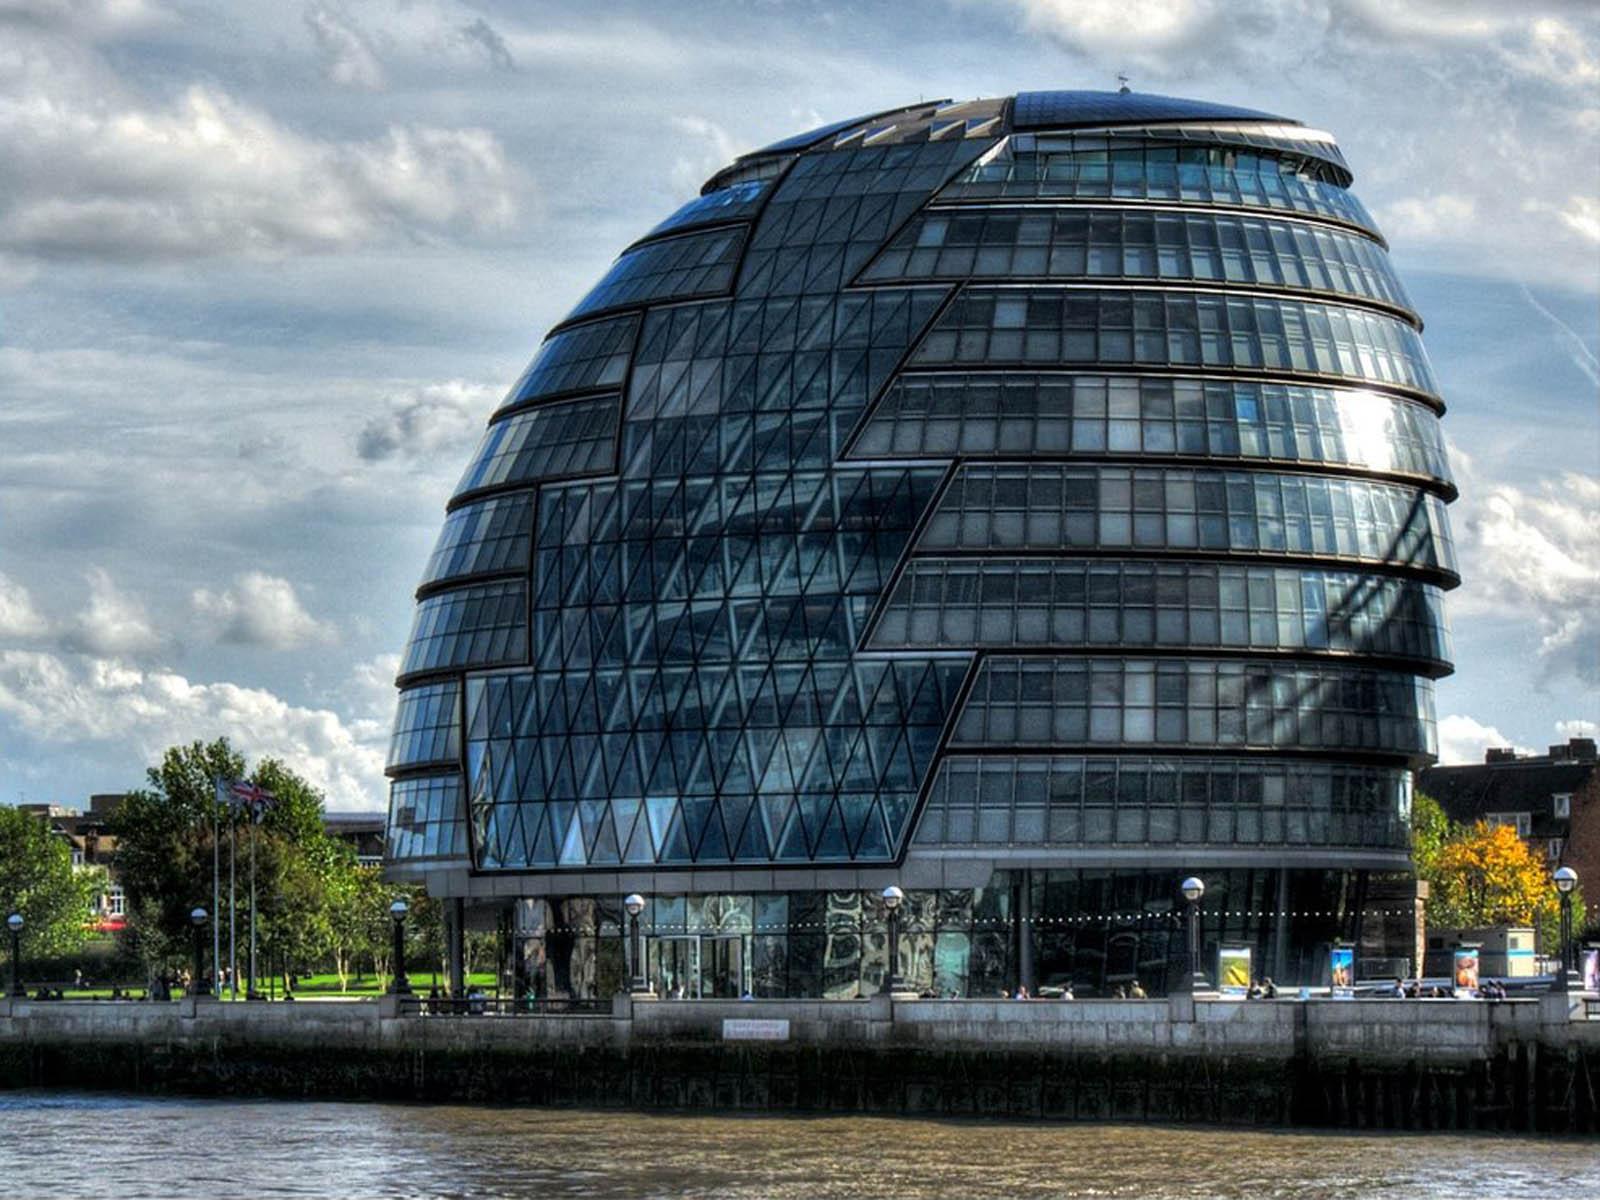 Wallpapers london city hall photos and wallpapers - Construcciones benjoal ...